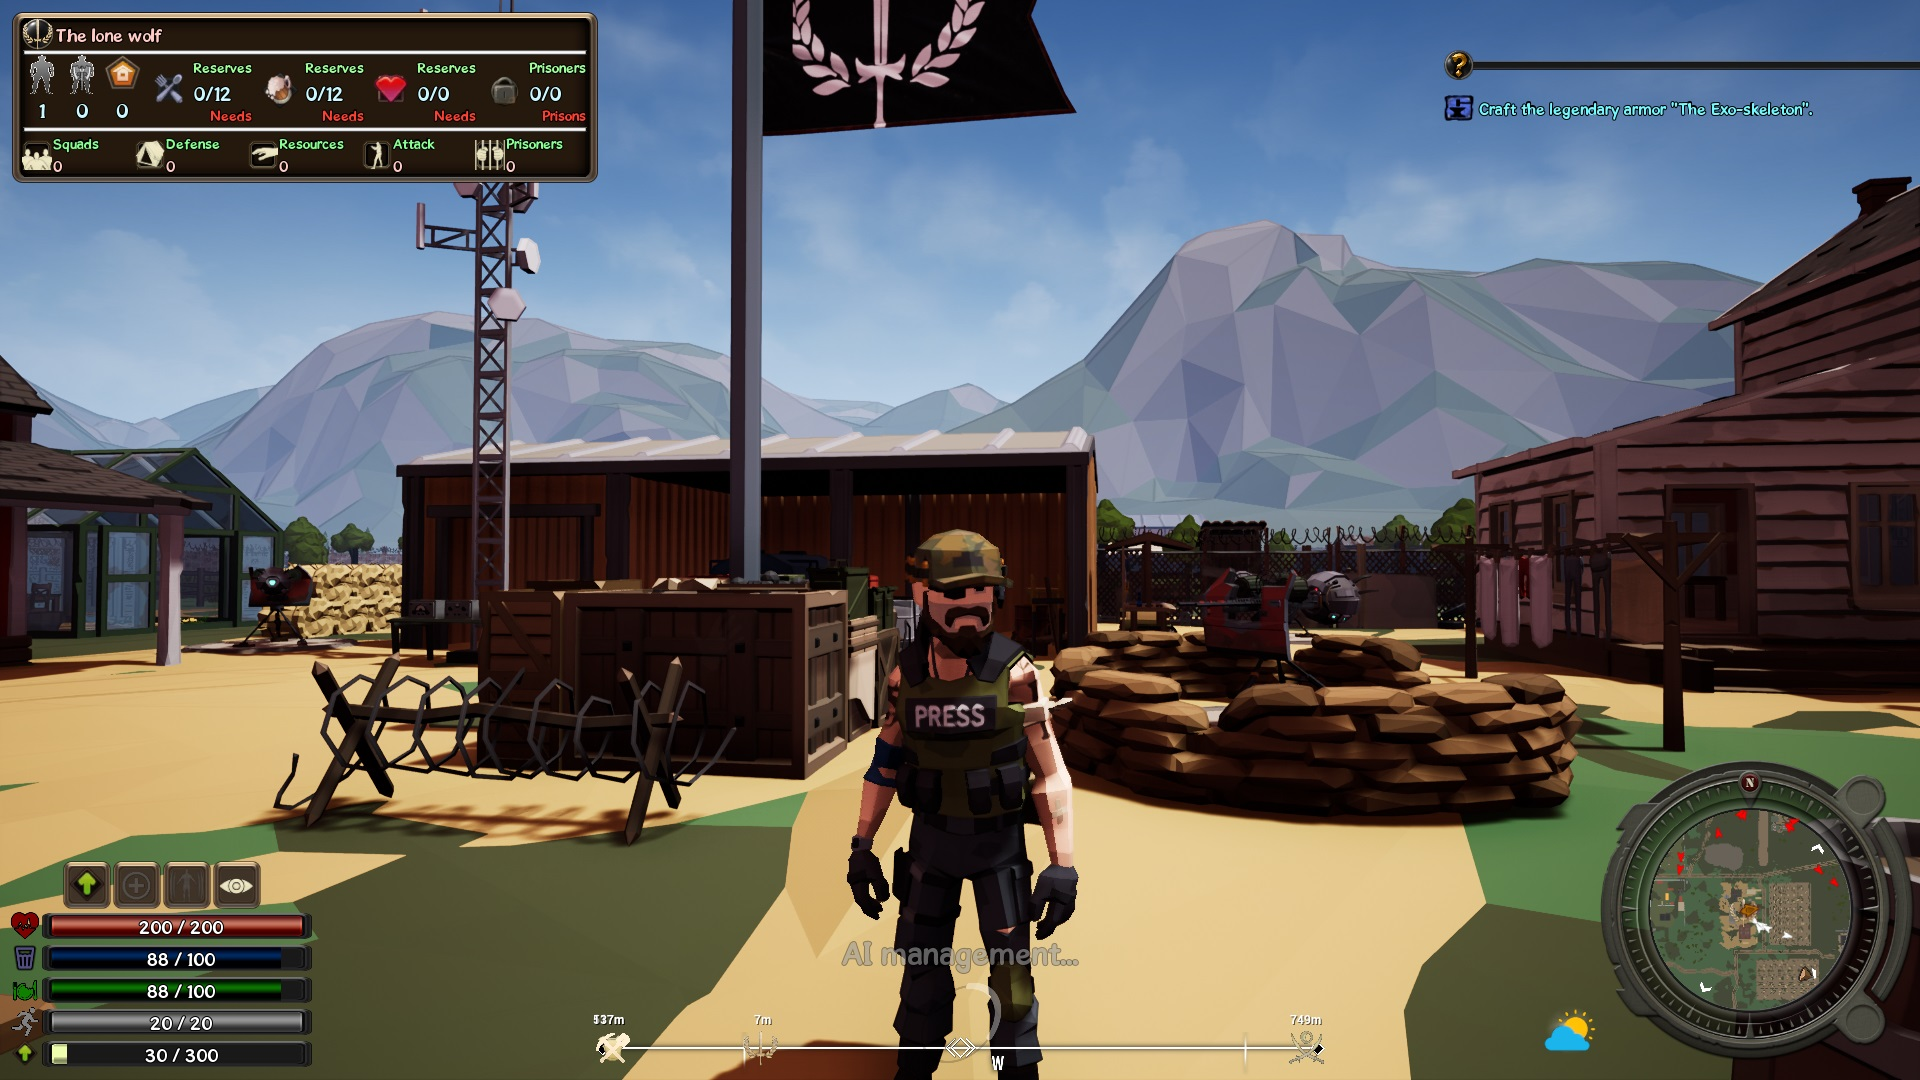 Heavenworld Screenshot 2020 04 3